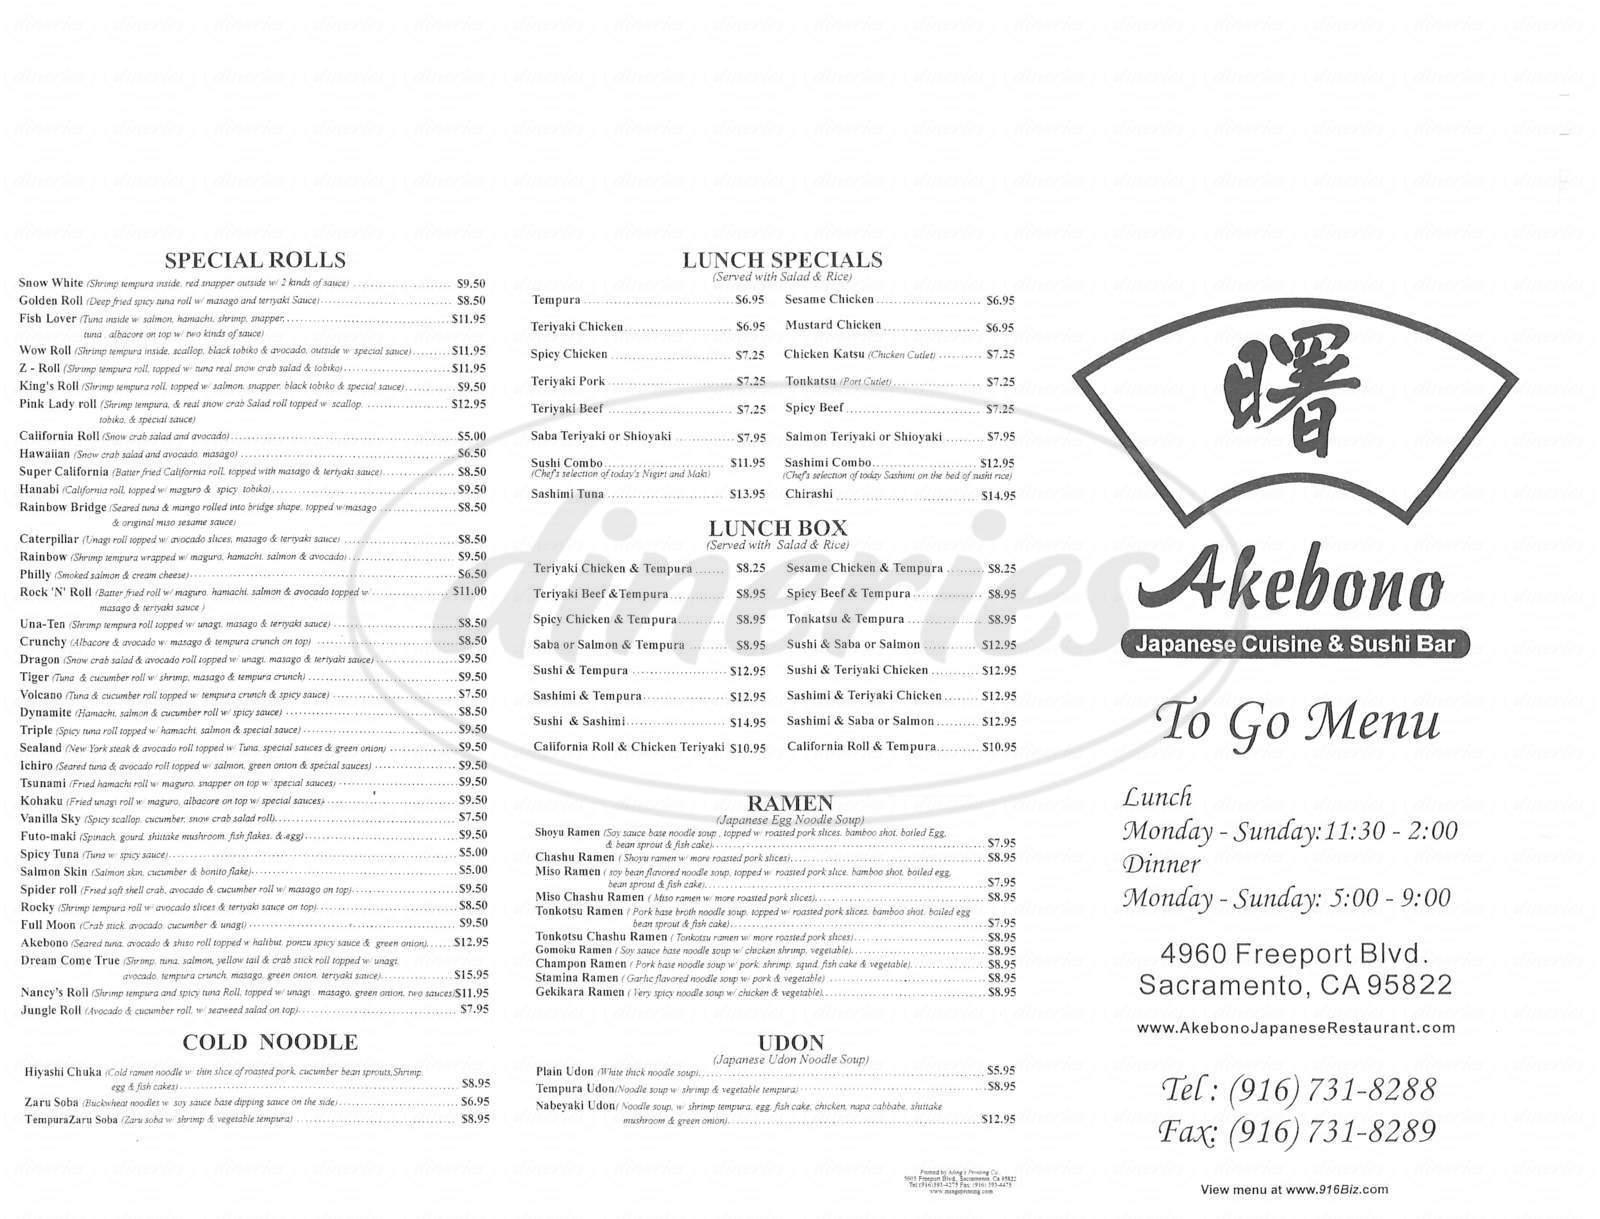 menu for Akebono